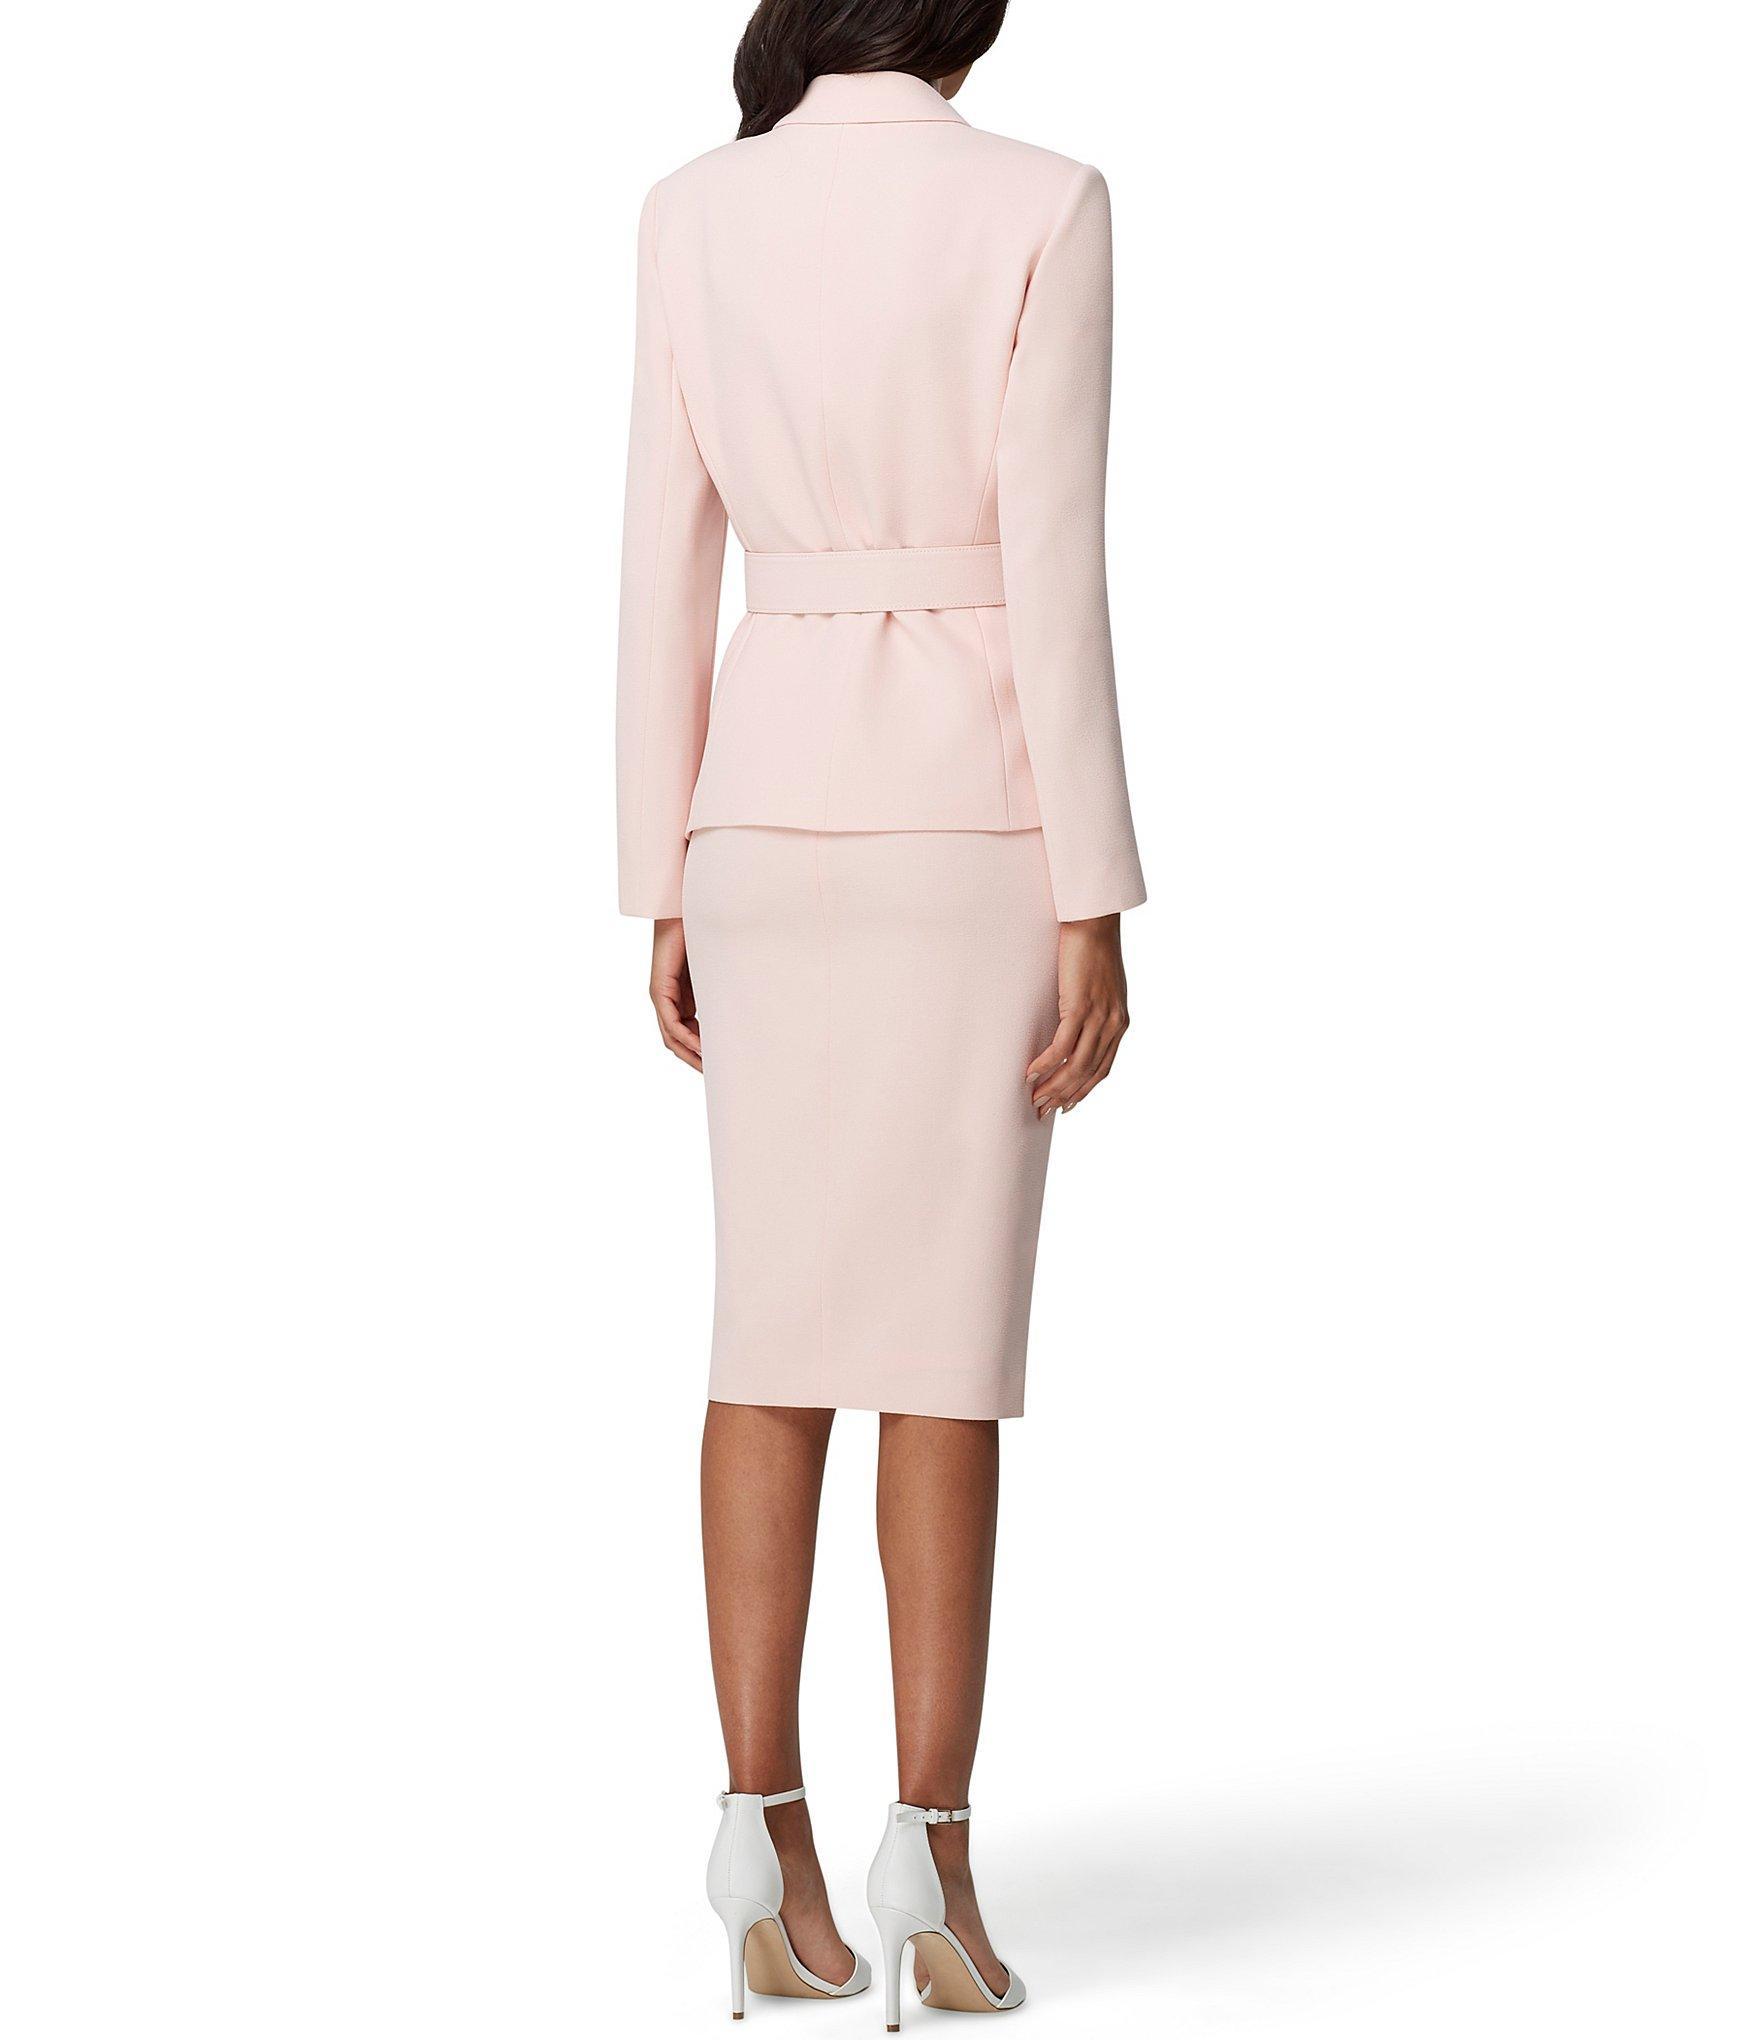 906333acc67 Tahari - Pink Belted Jacket Skirt Suit - Lyst. View fullscreen